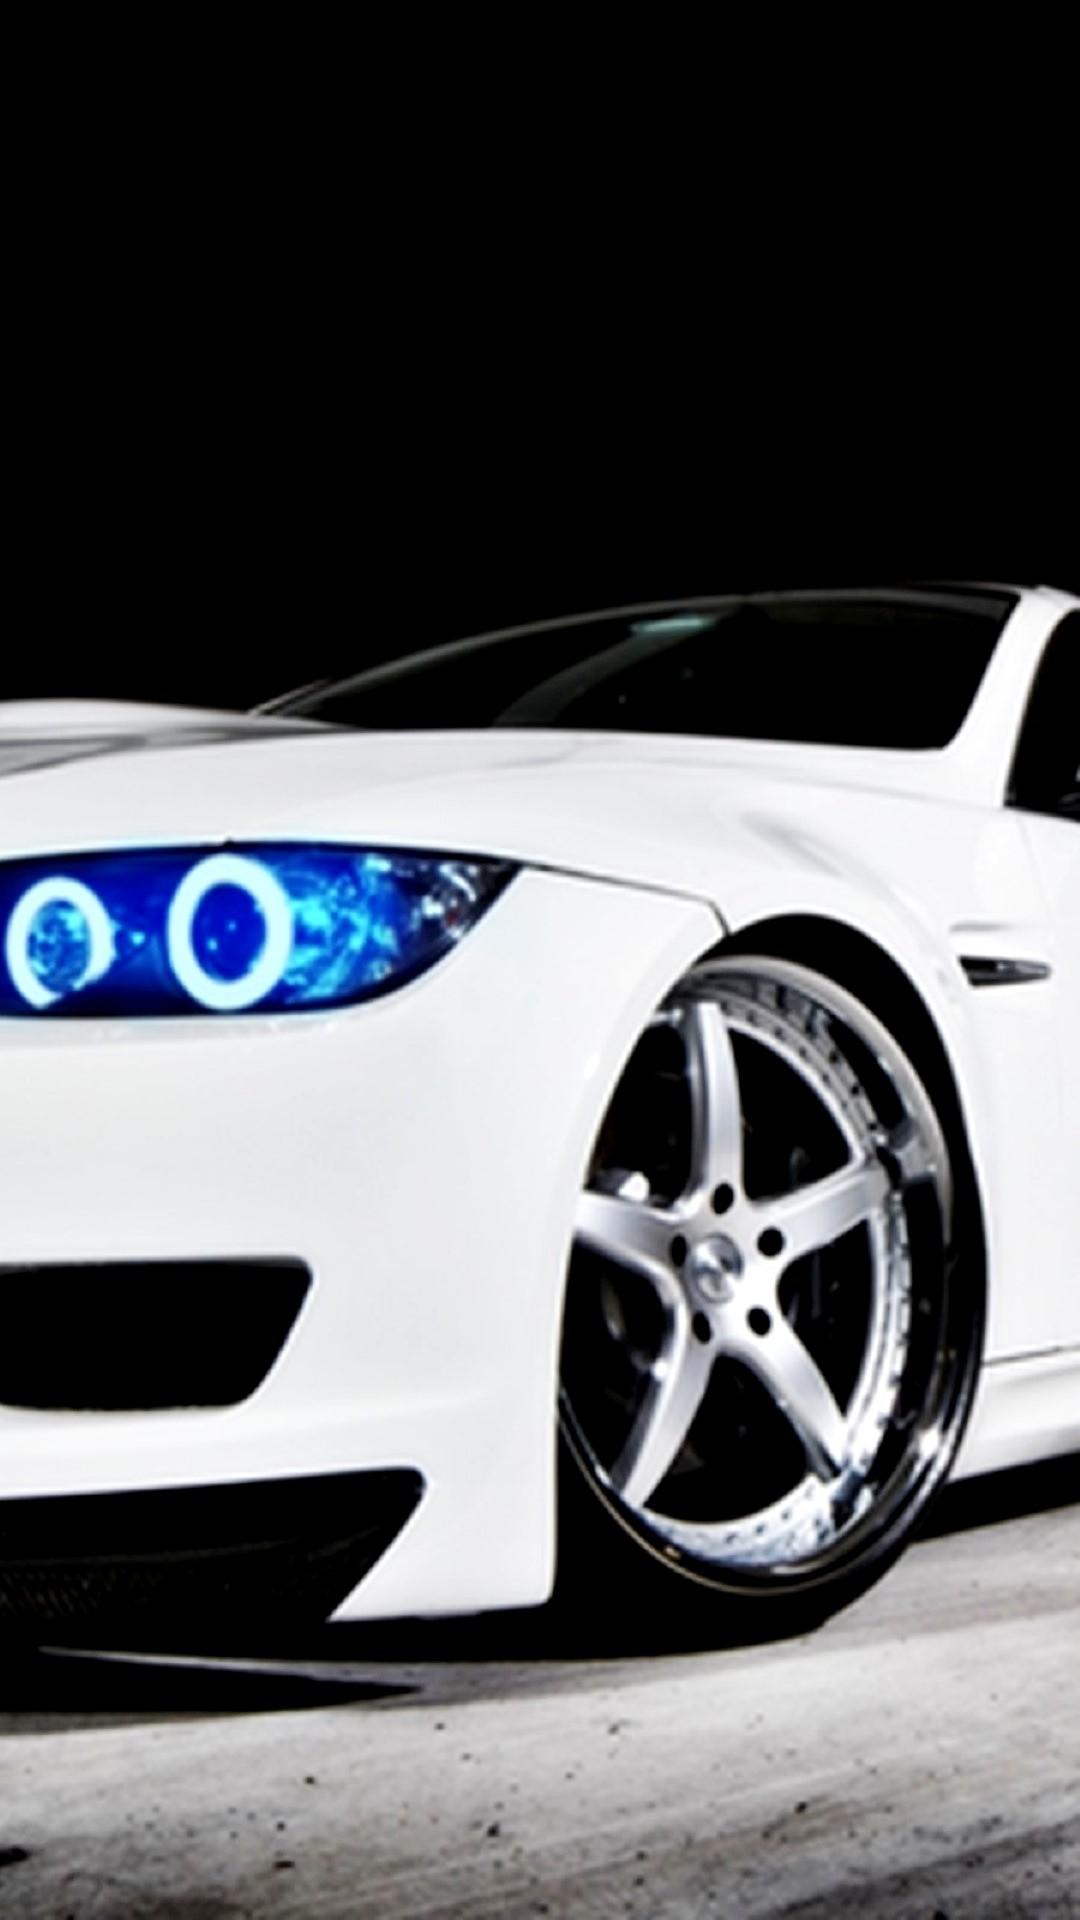 BMW M3 White Blue Headlights iPhone 6 Plus HD Wallpaper